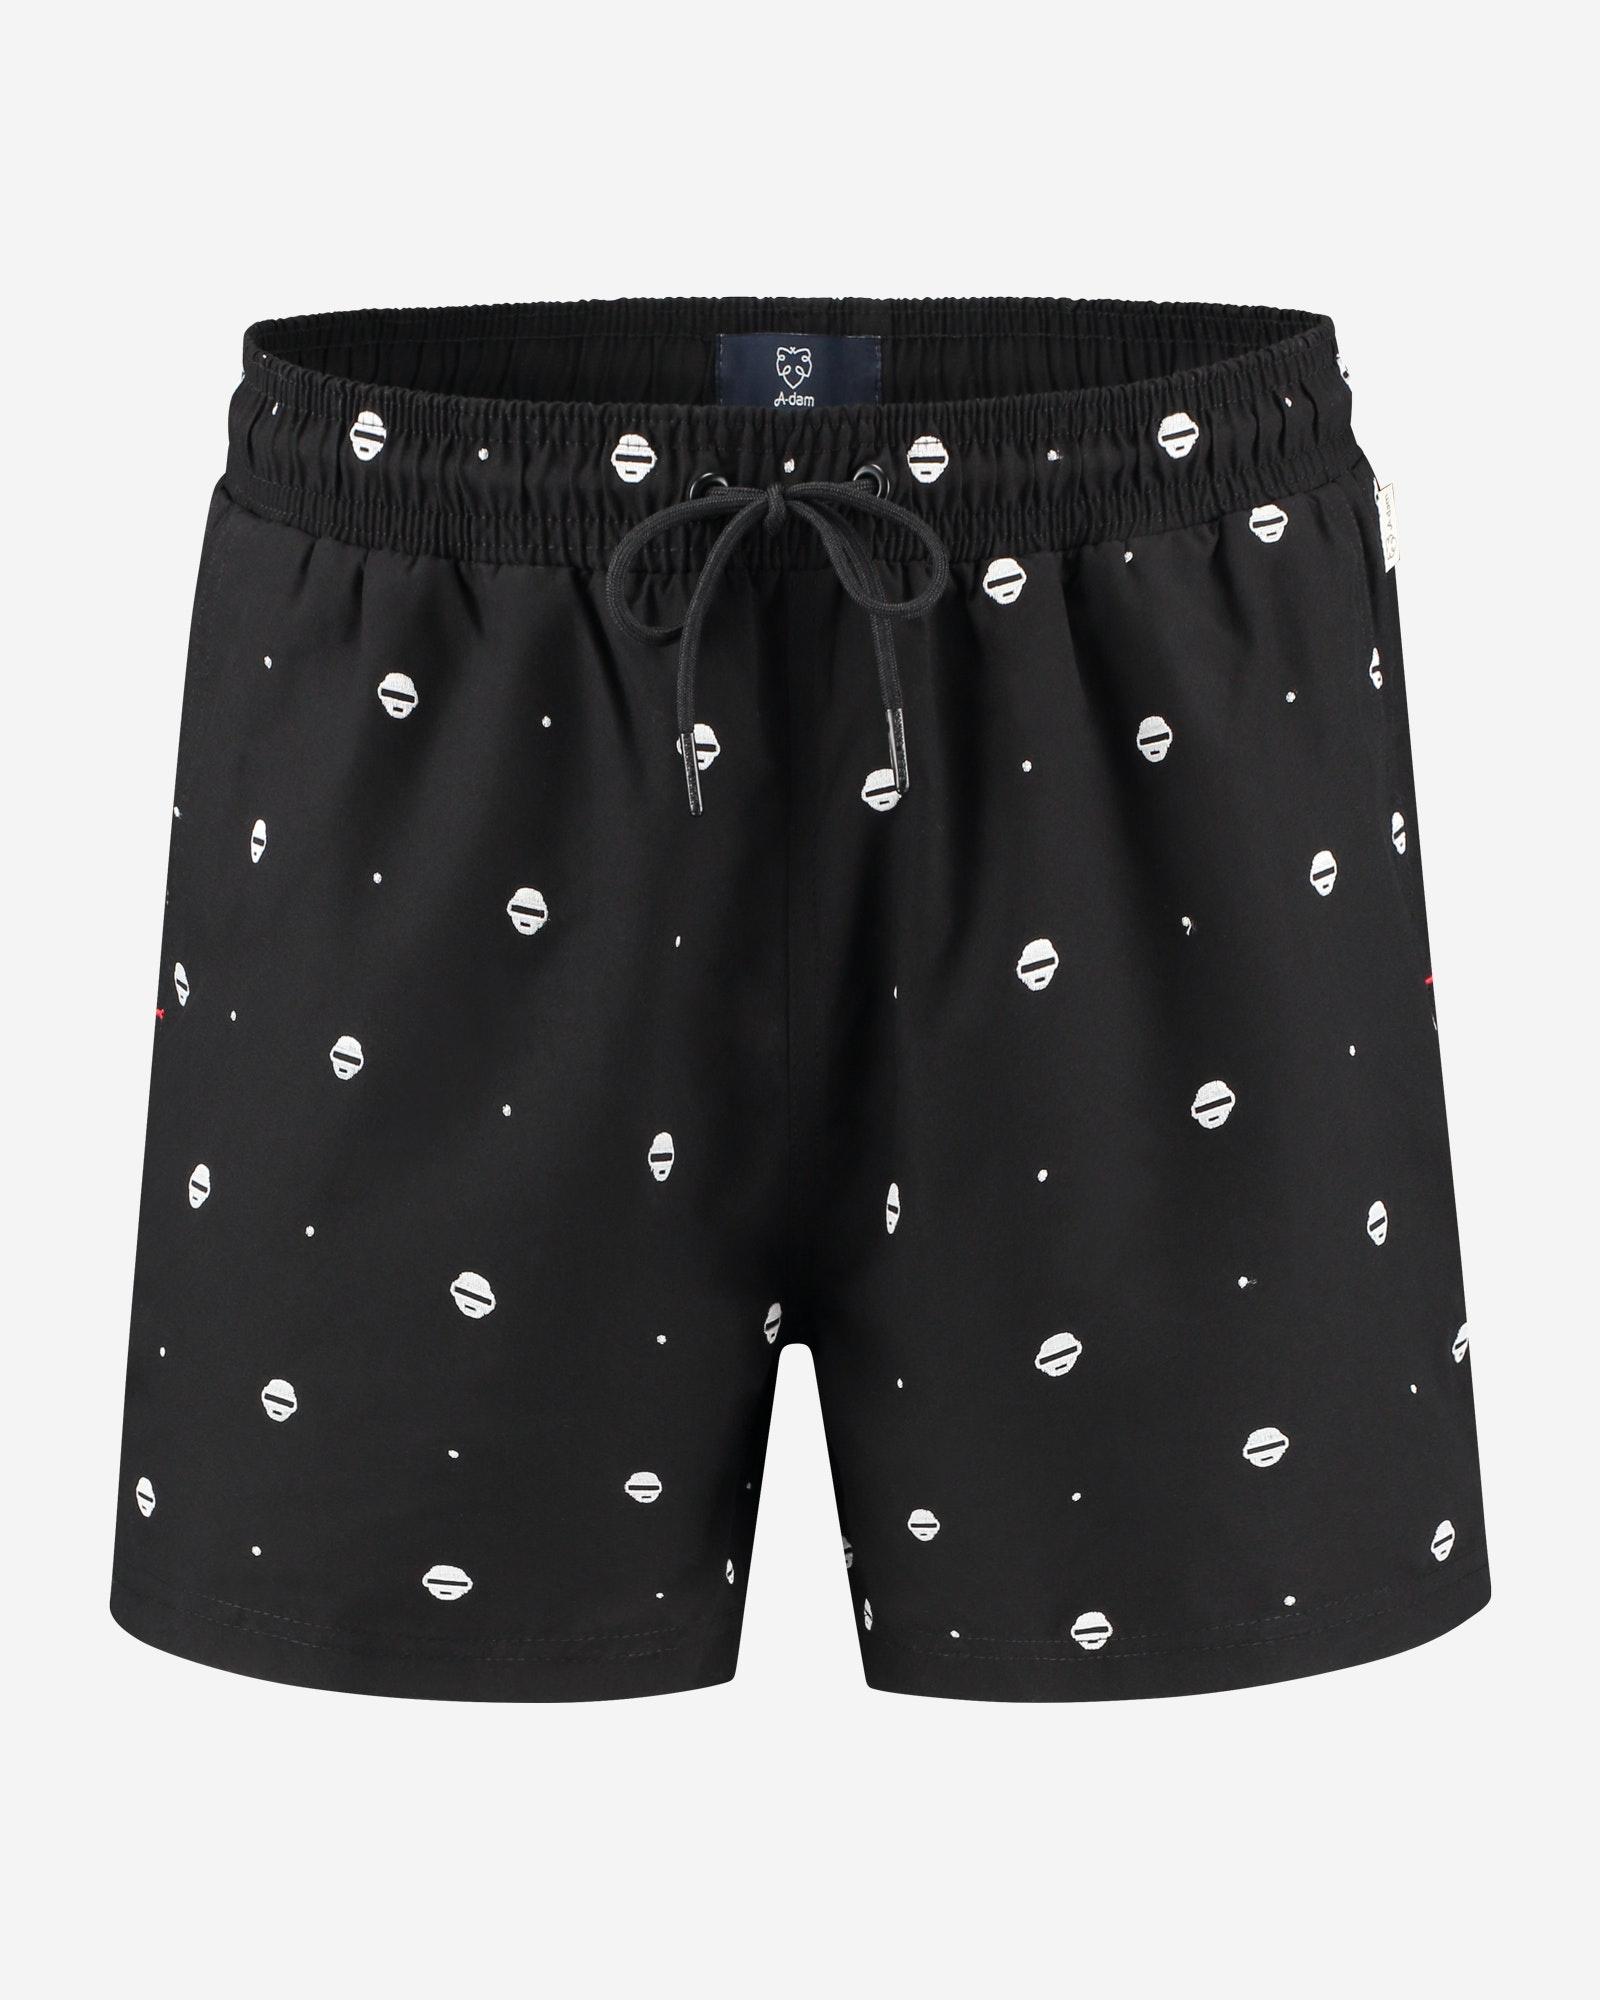 A-dam Swim short Jarl black